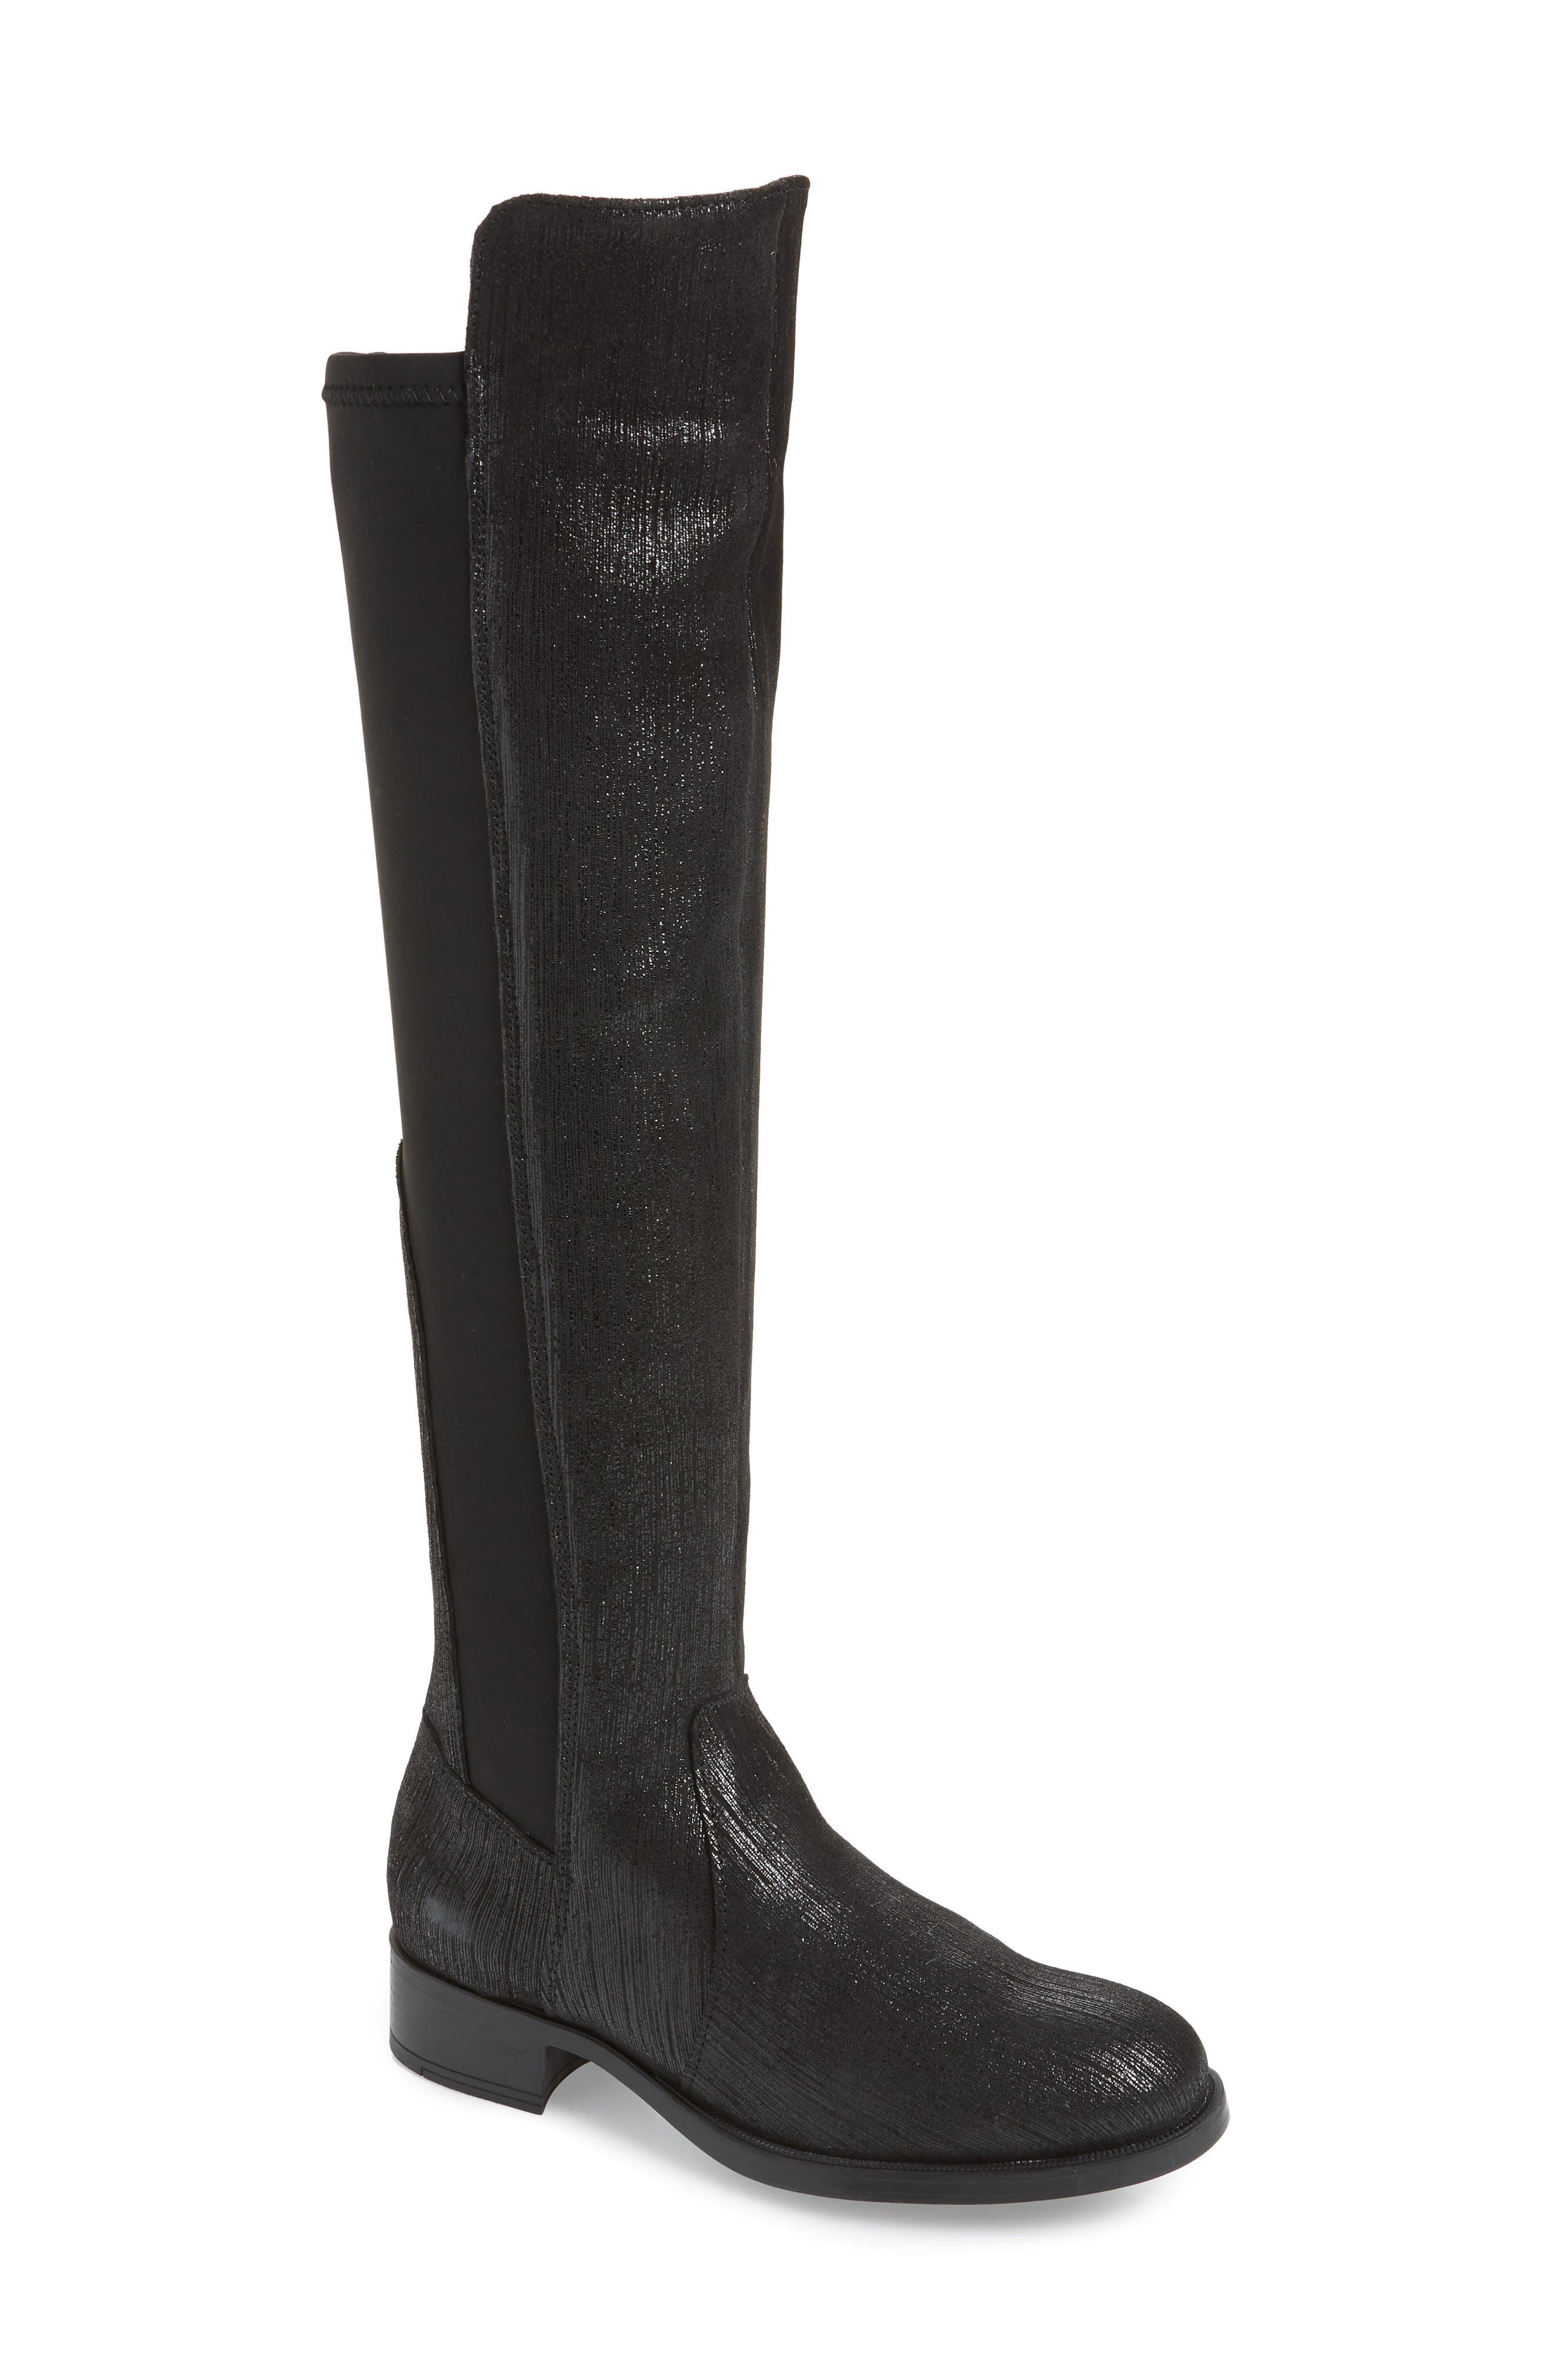 Bos. & Co. Bunt Waterproof Over The Knee Boot, Black